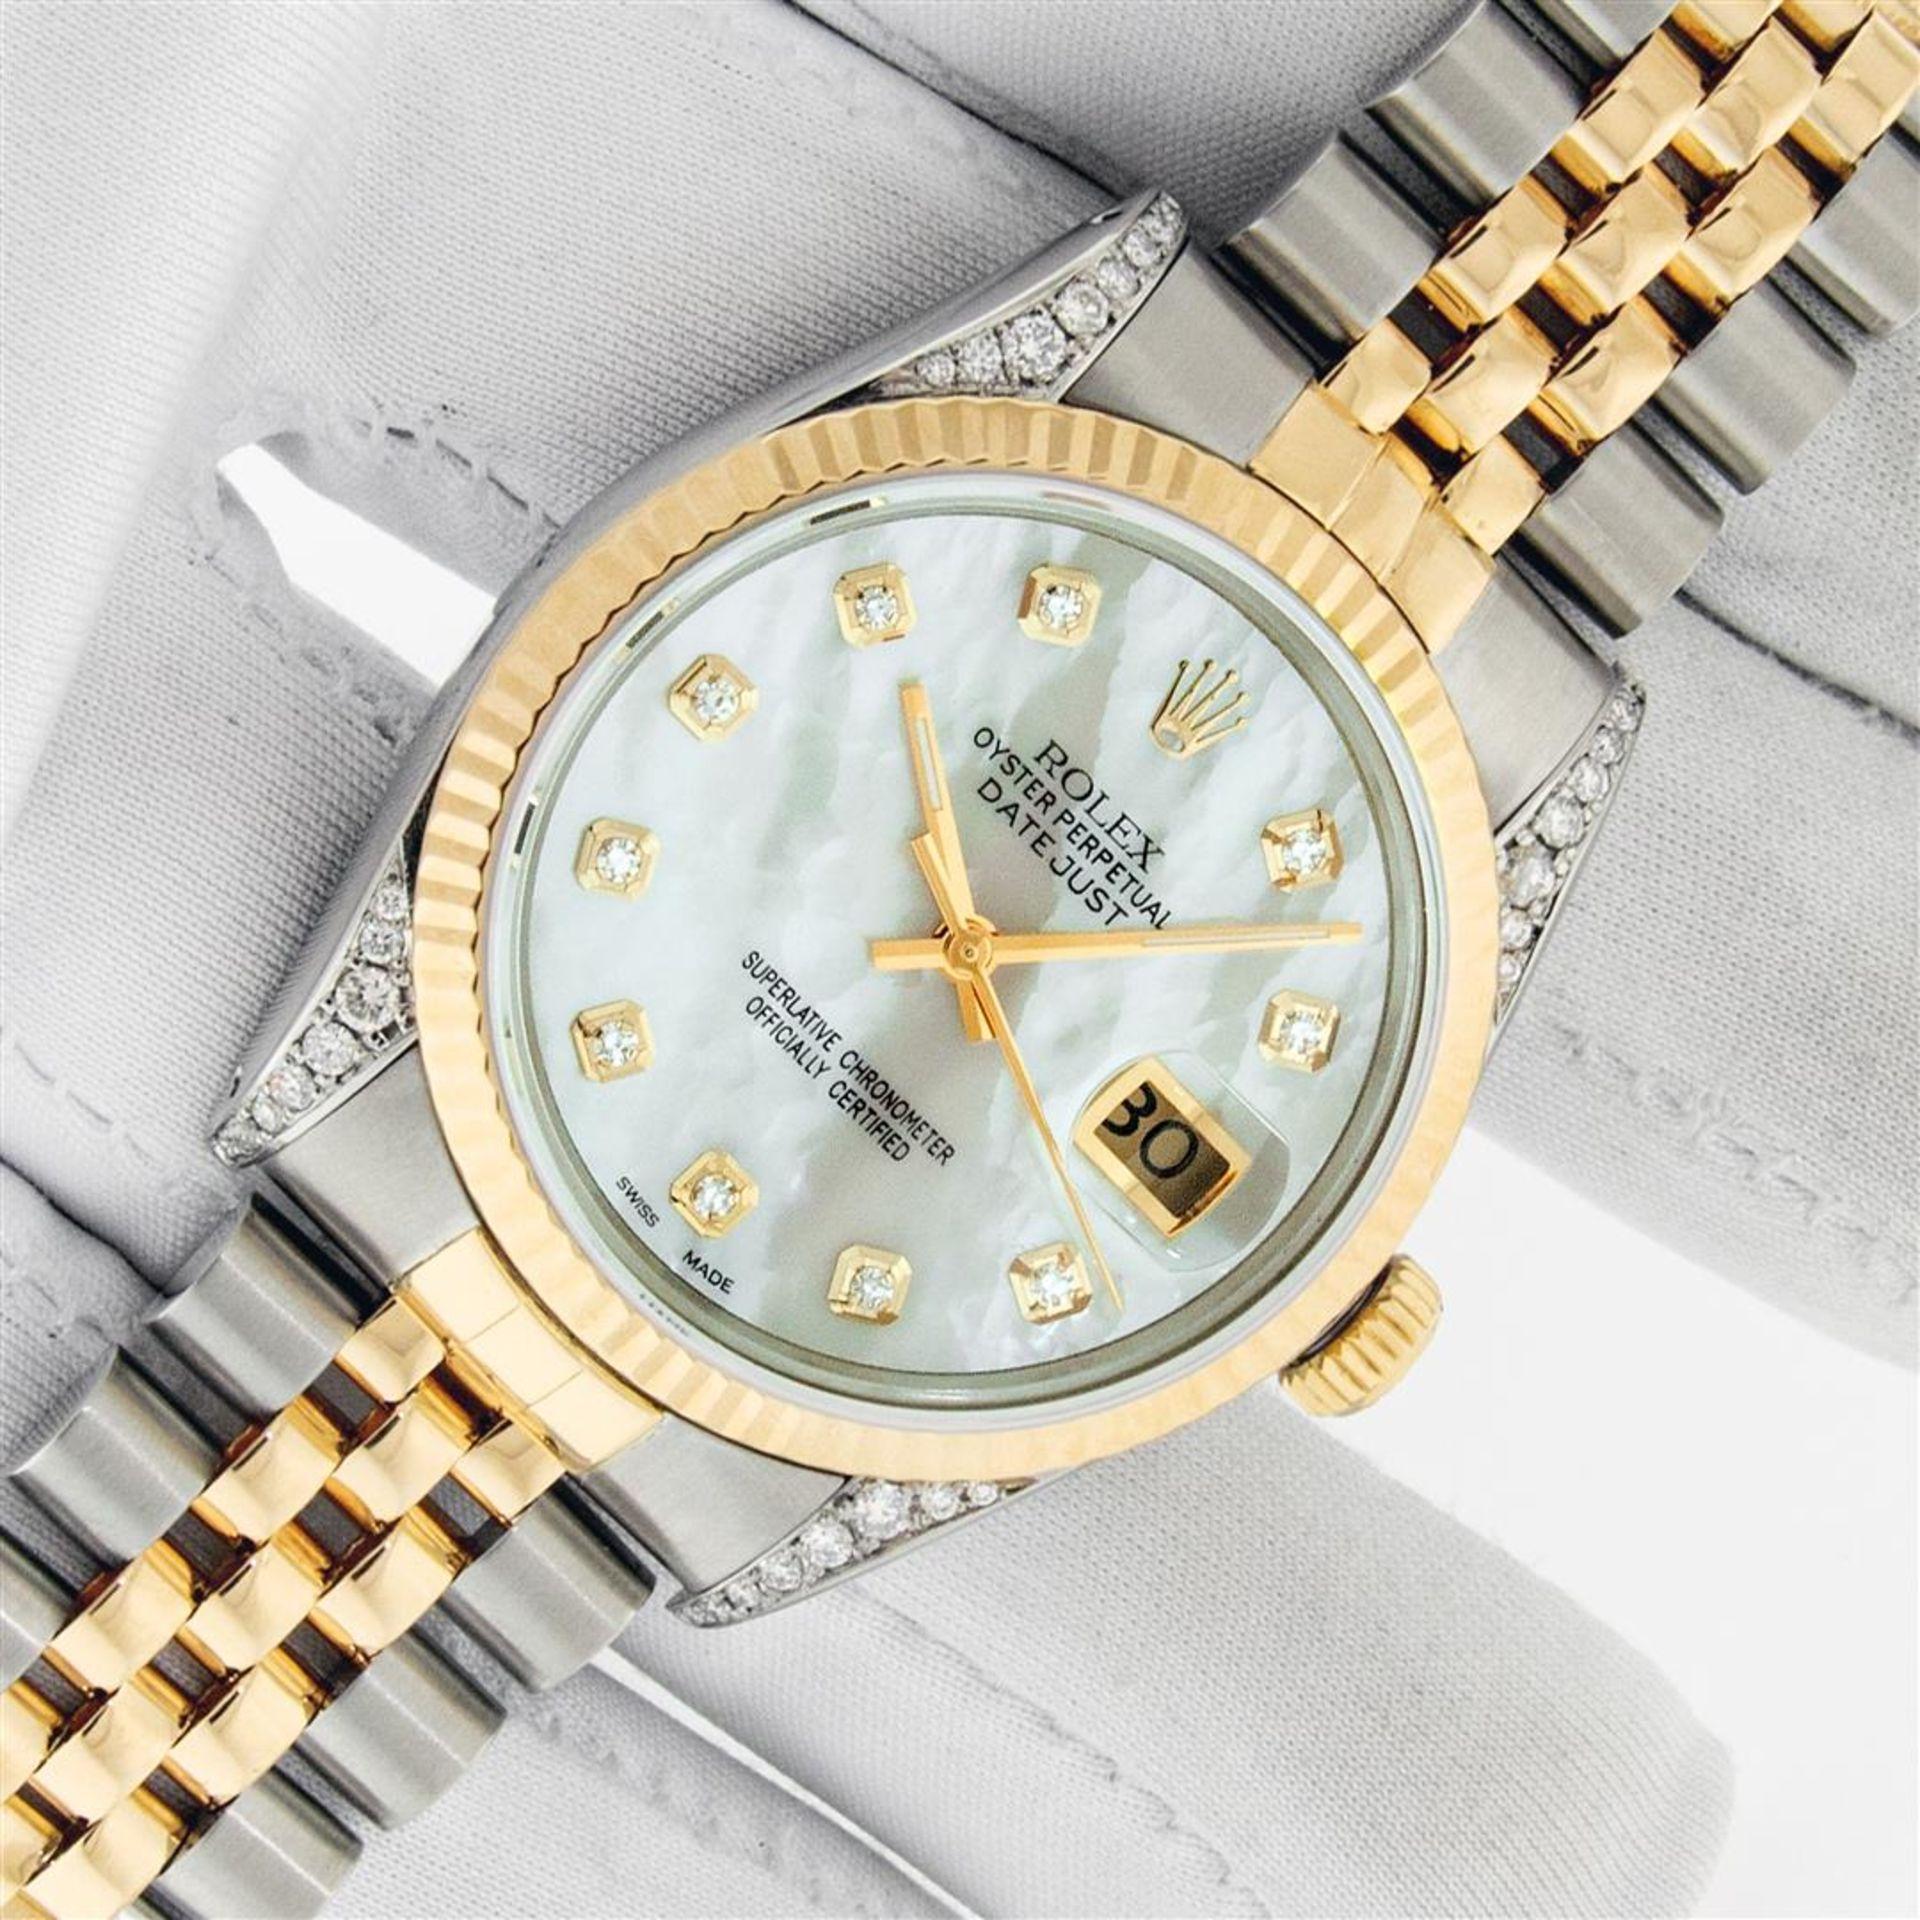 Rolex Mens 2 Tone MOP Diamond Lugs 36MM Datejust Wristwatch - Image 2 of 9